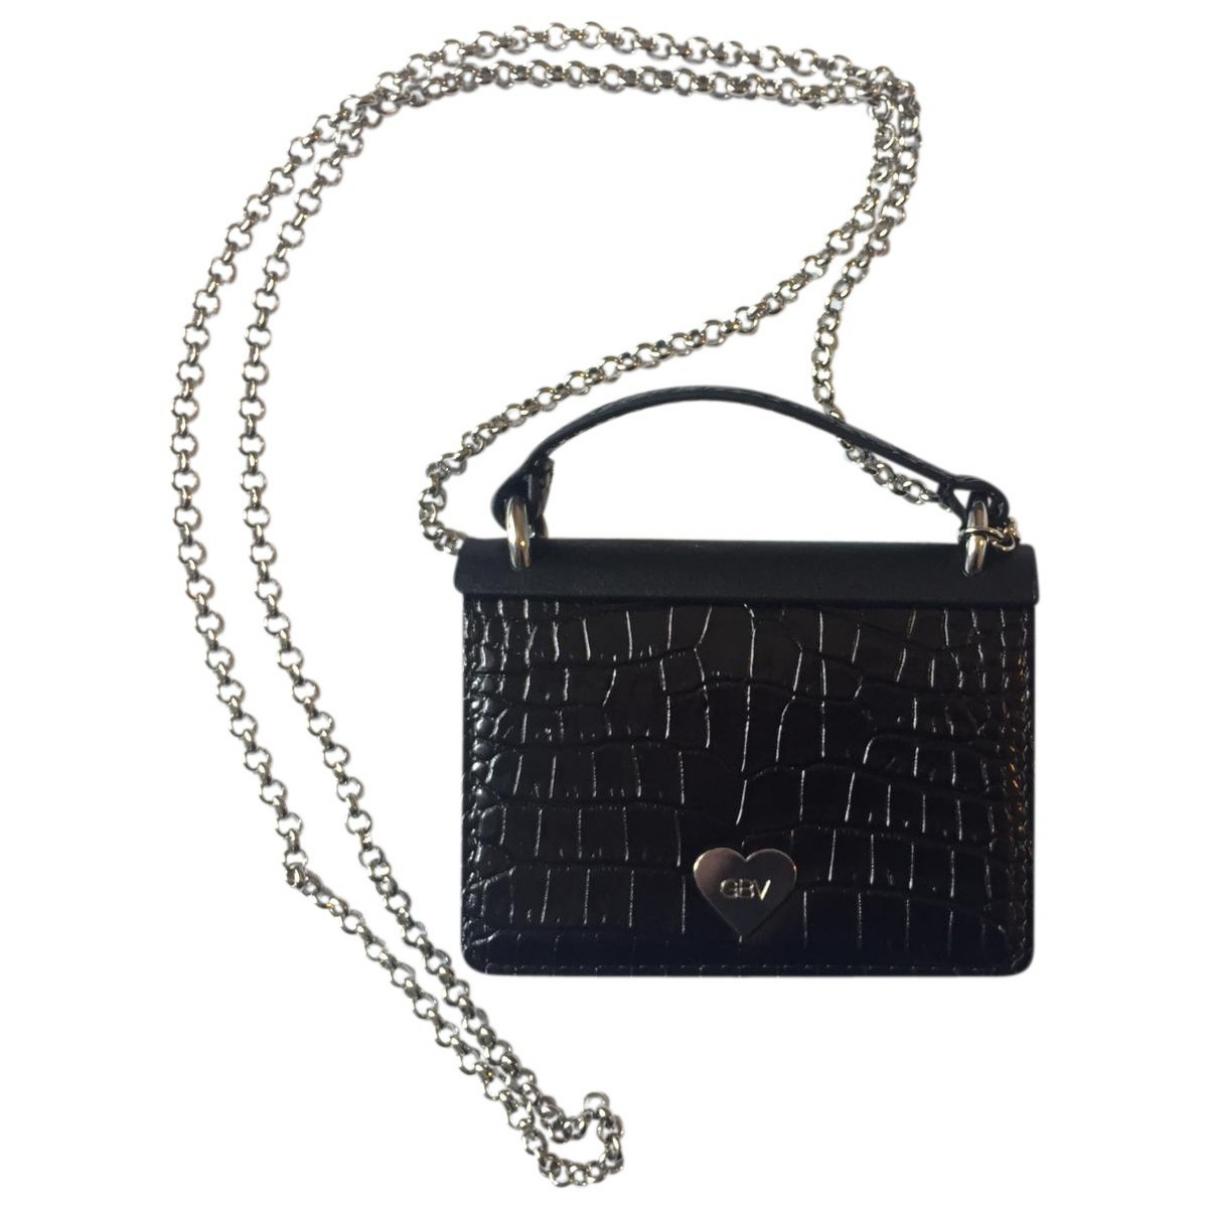 Giambattista Valli X H&m \N Black Leather handbag for Women \N